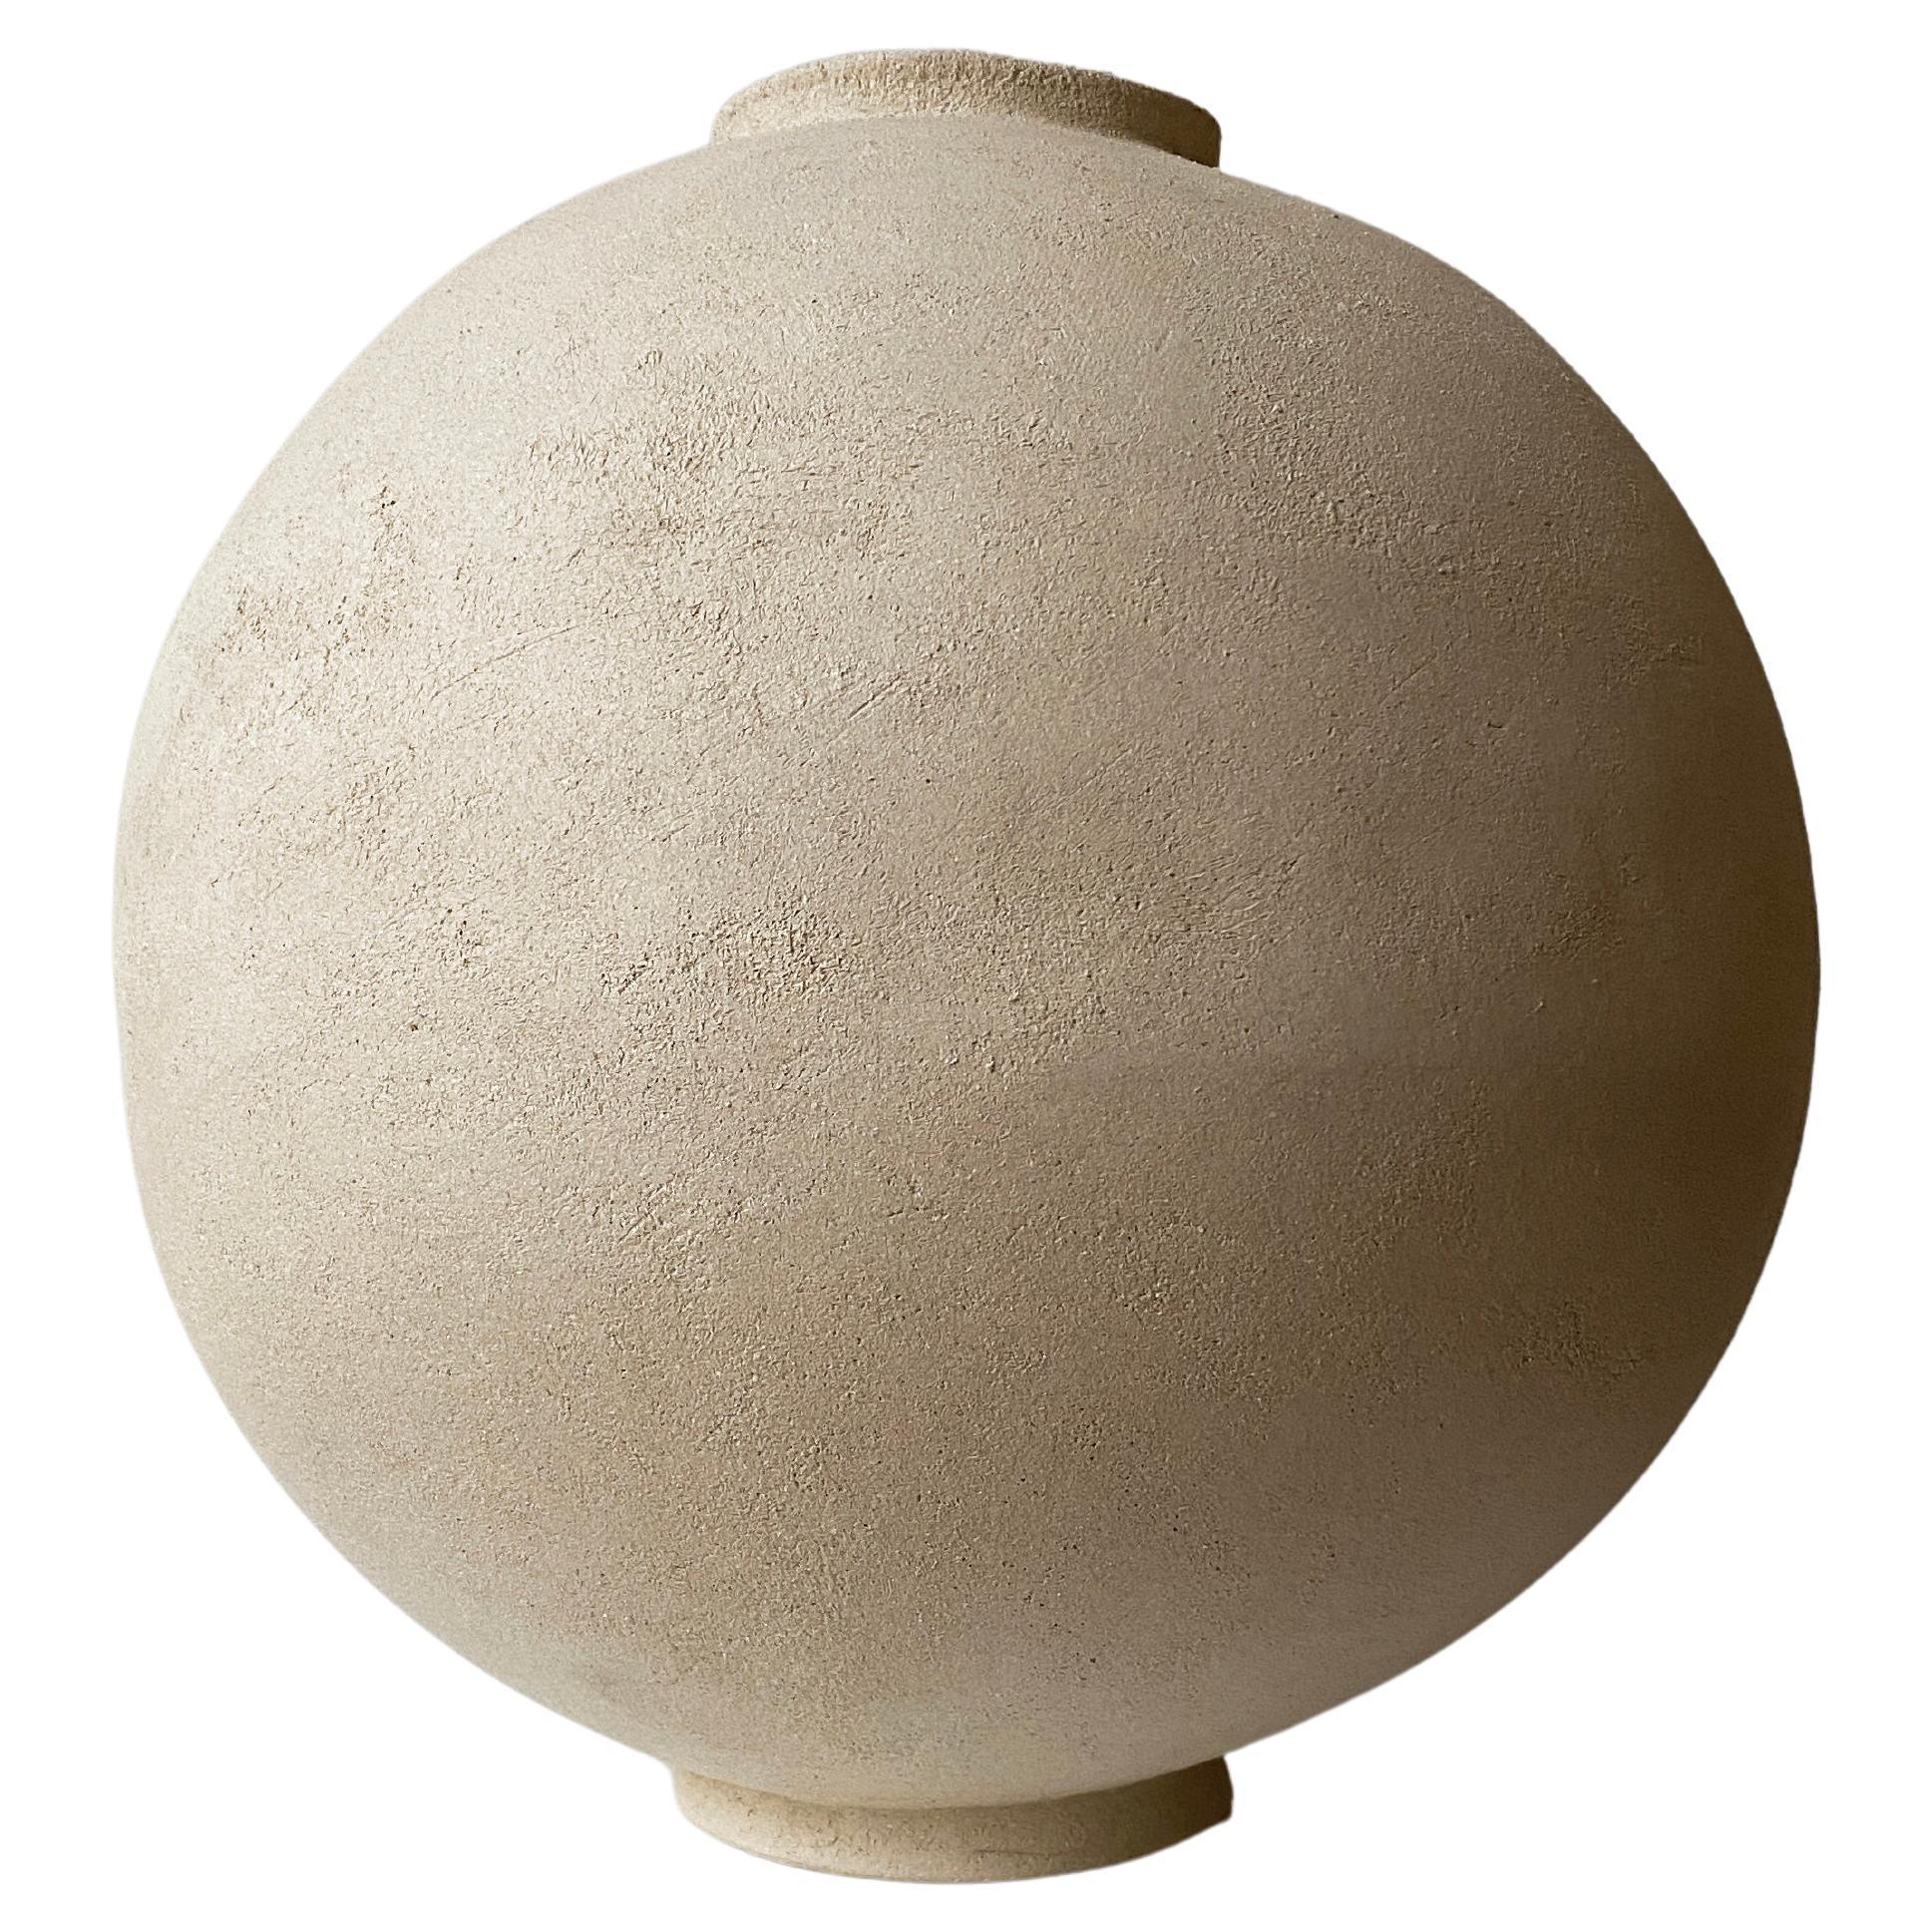 Sandstone Moon Jar by Laura Pasquino